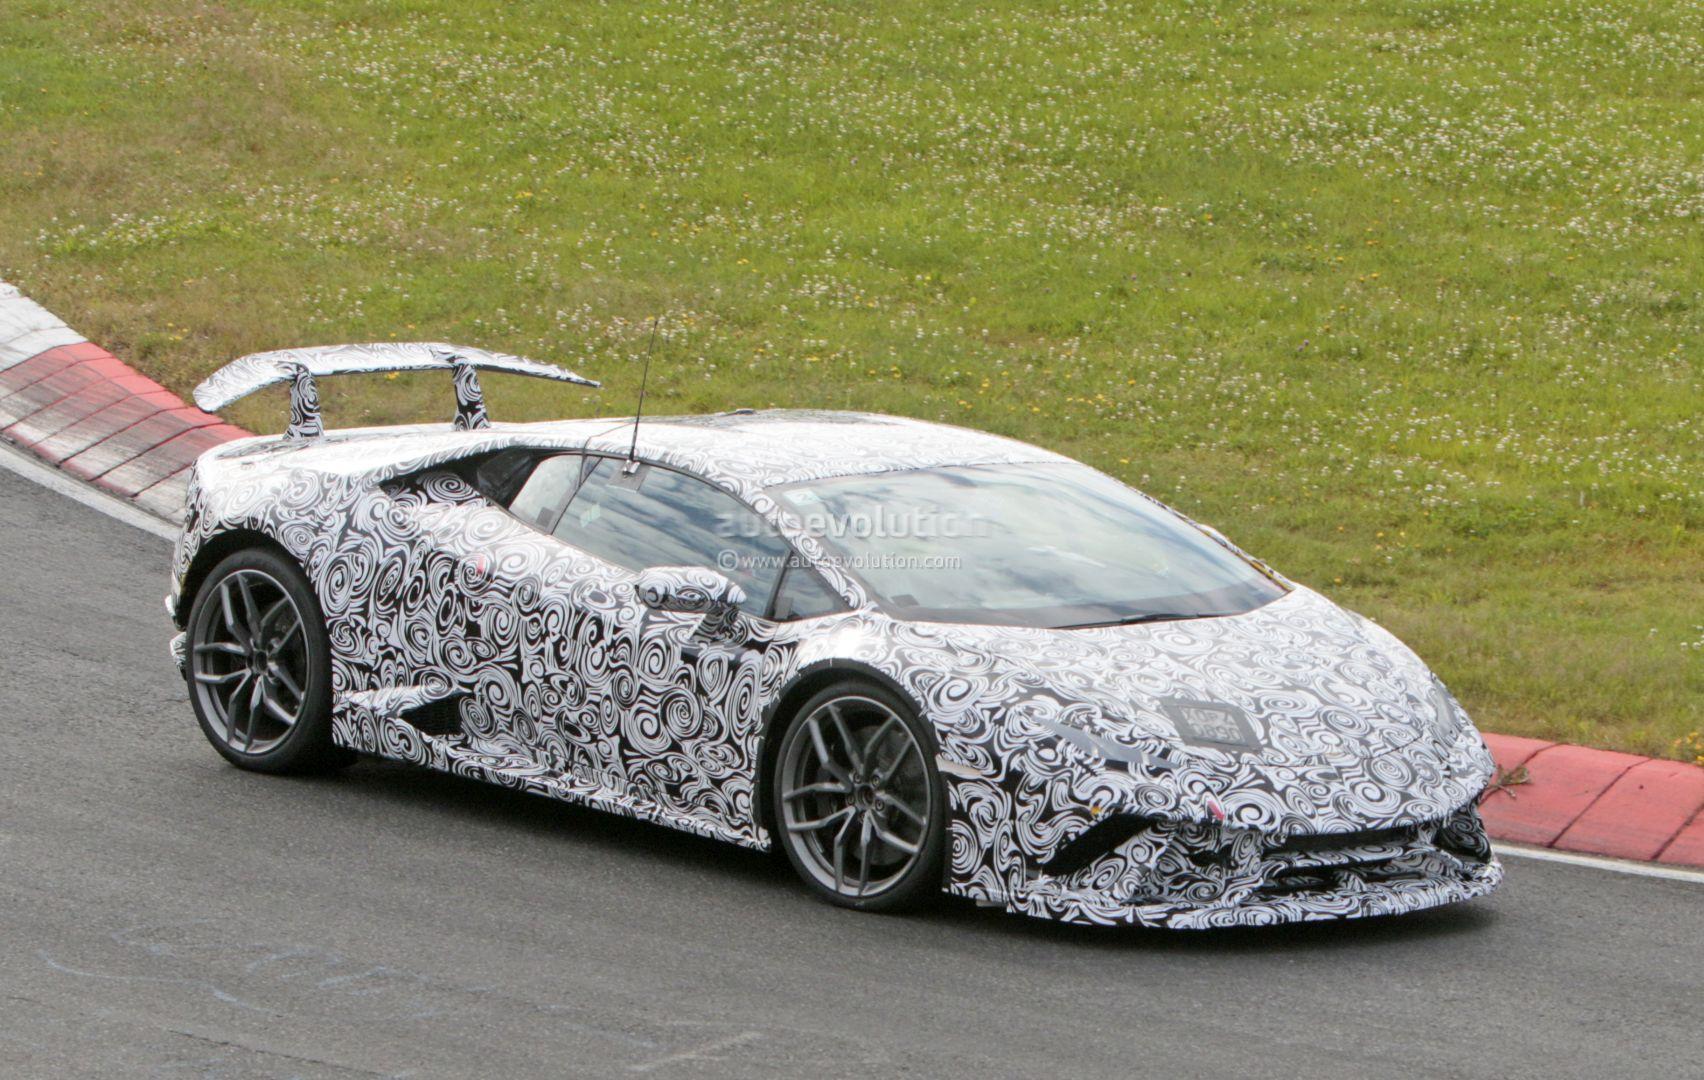 Lamborghini Aventador Spyder >> Huracan Superleggera and Green Aventador Miura Homage Spied With Minimal Camo - autoevolution